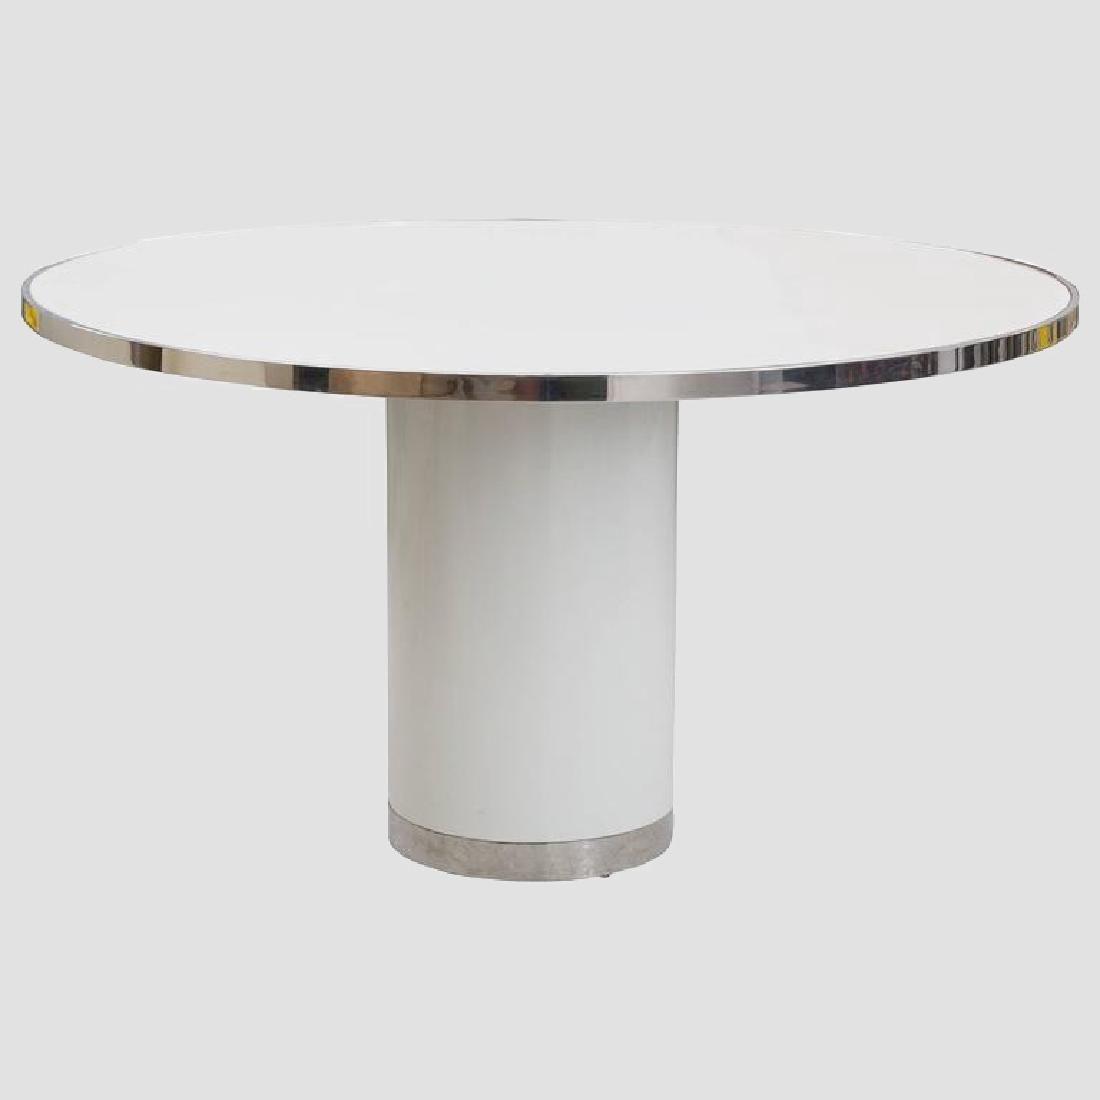 Table by Stanley J. Friedman for Brueton